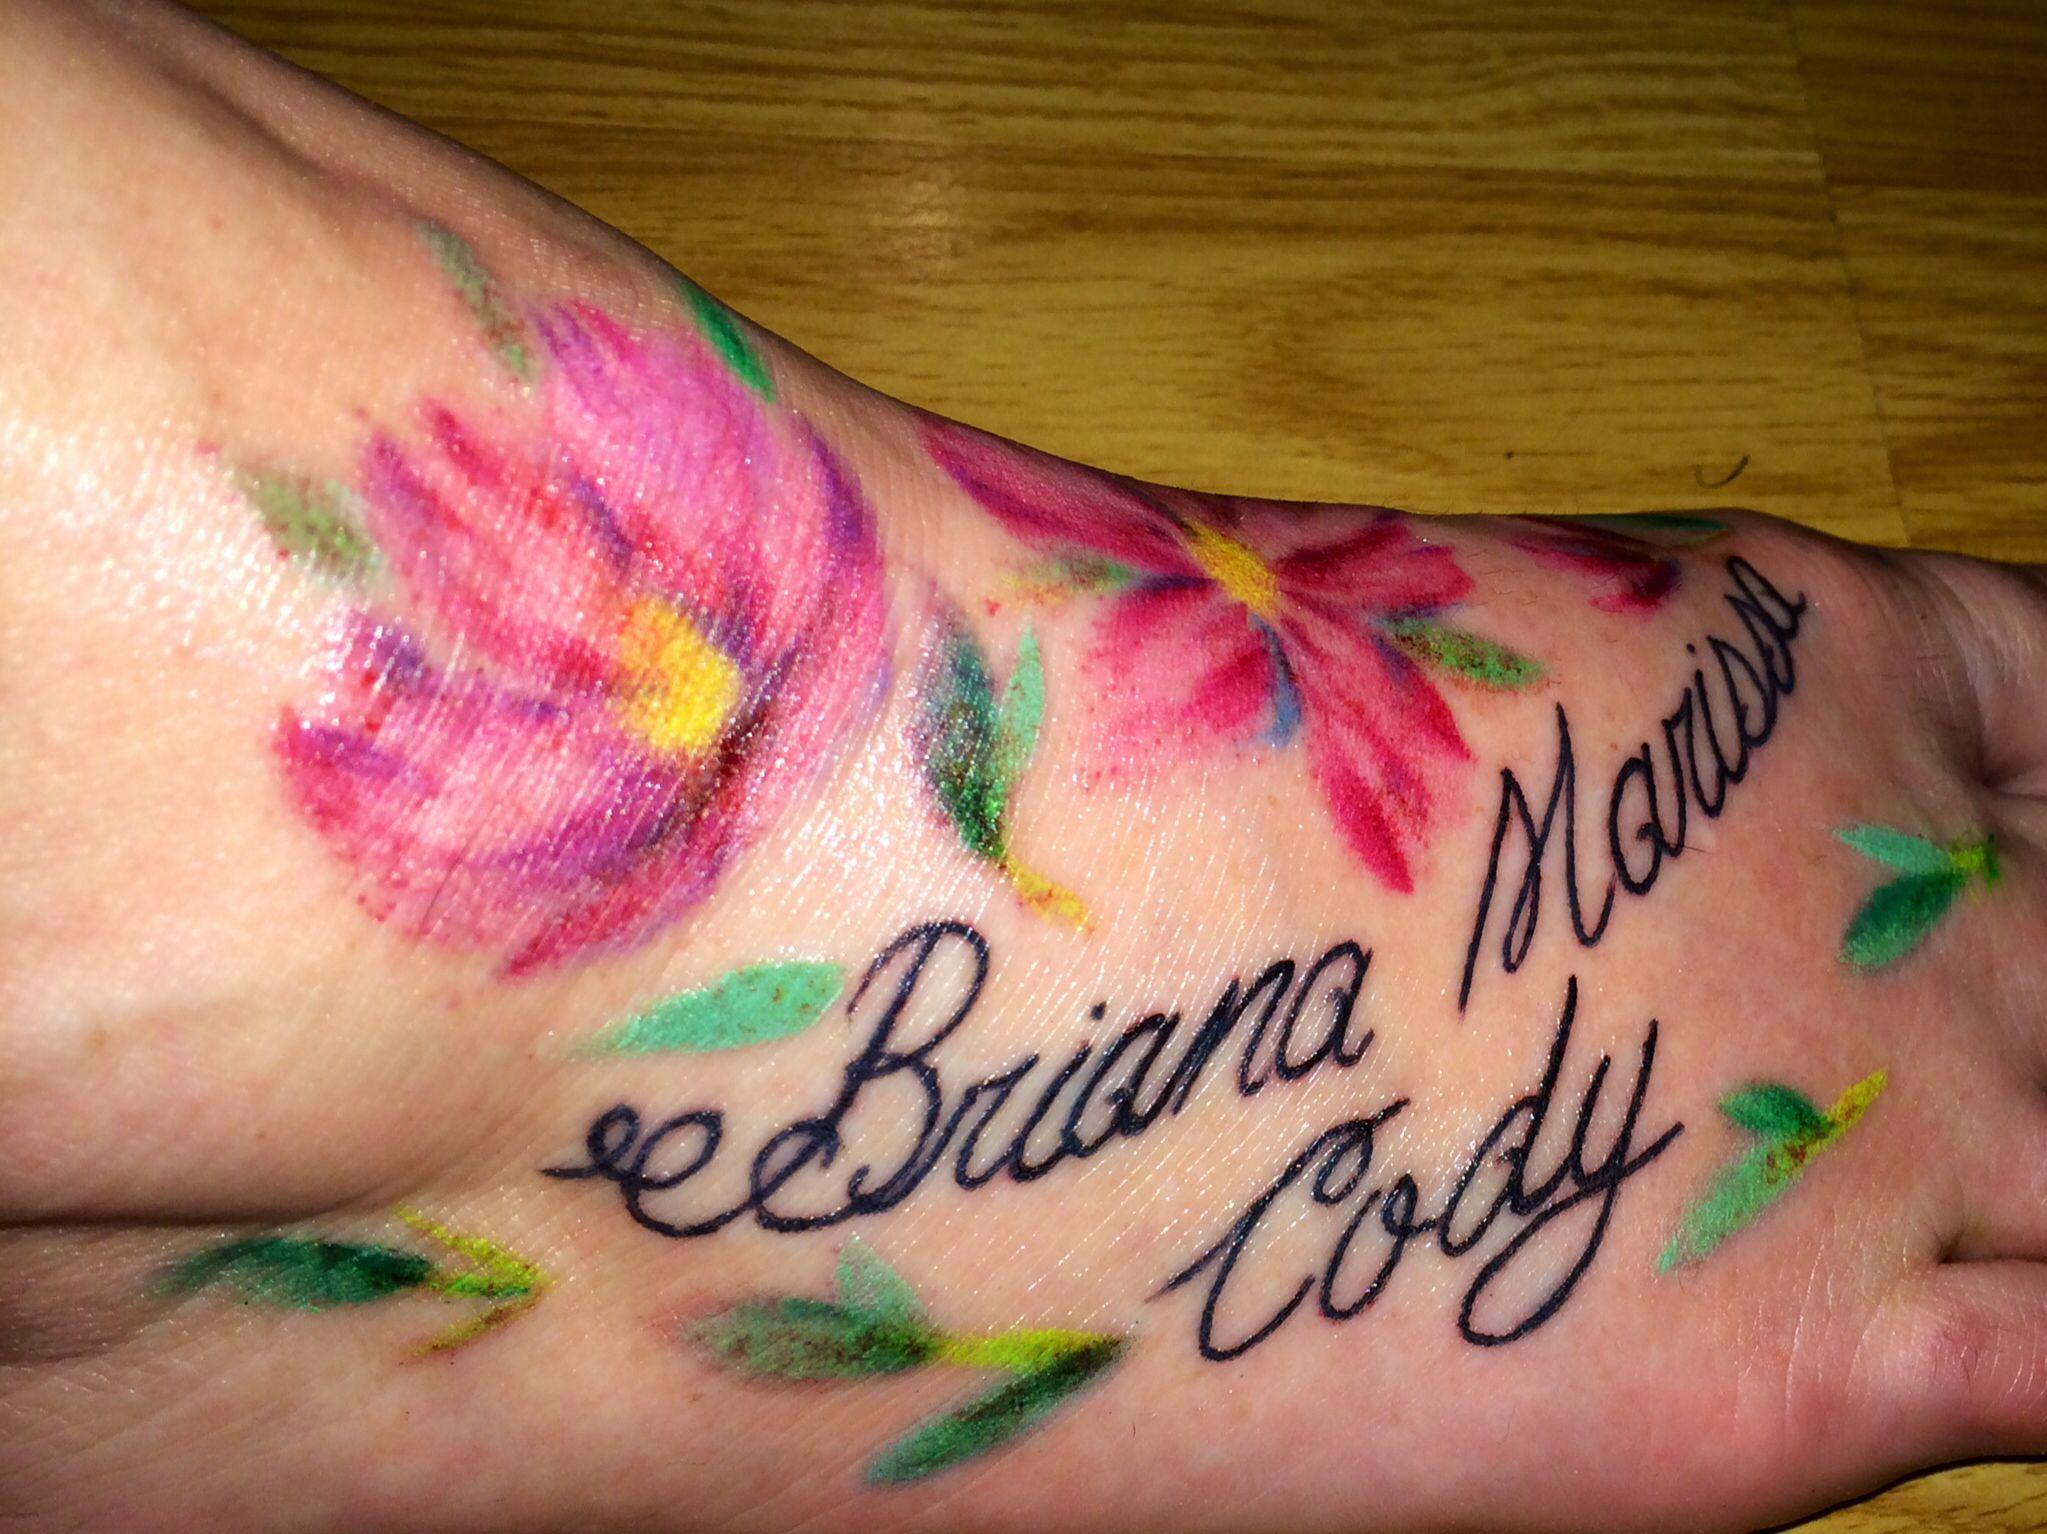 New piercing ideas  My new foot tattoo  TattoosPiercings  Pinterest  Piercing and Tattoo